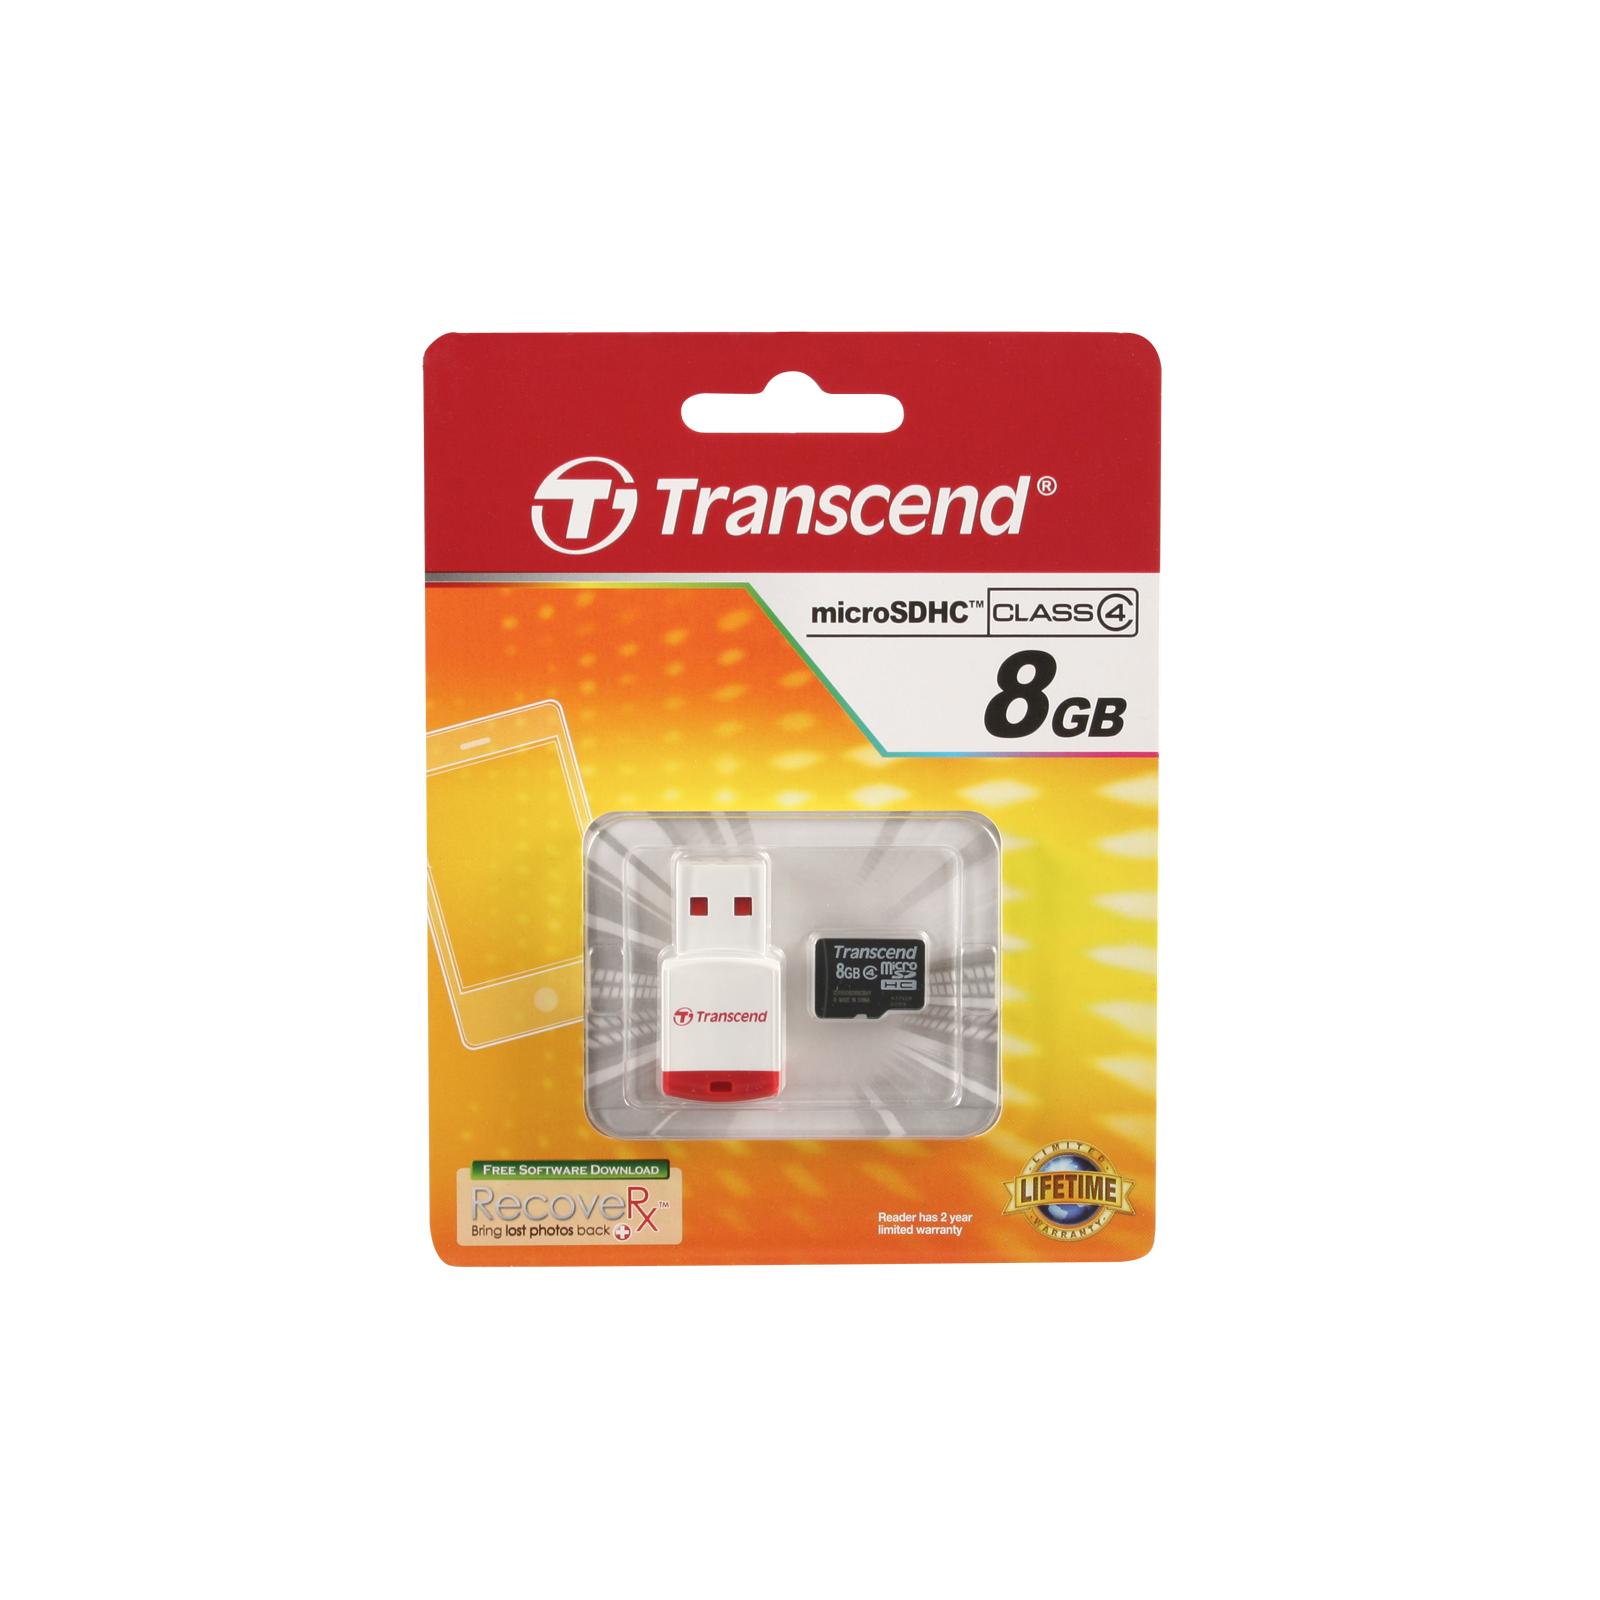 Карта памяти Transcend 8Gb microSDHC class 4 (TS8GUSDHC4-P3) изображение 2